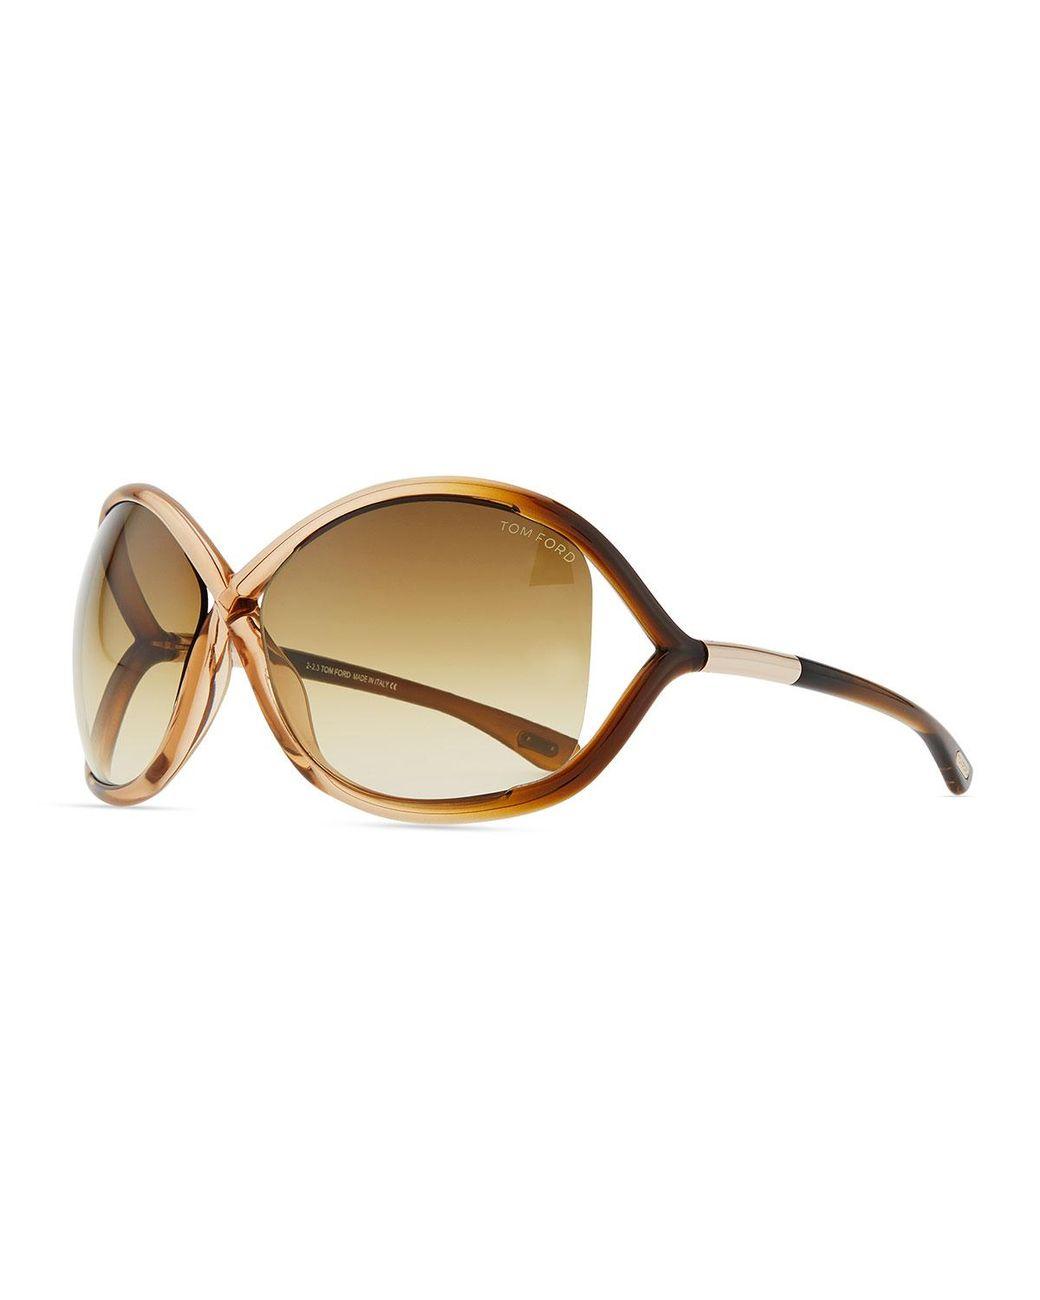 5873cc0e10f Lyst - Tom Ford Whitney Cross-bridge Sunglasses in Pink - Save 2%